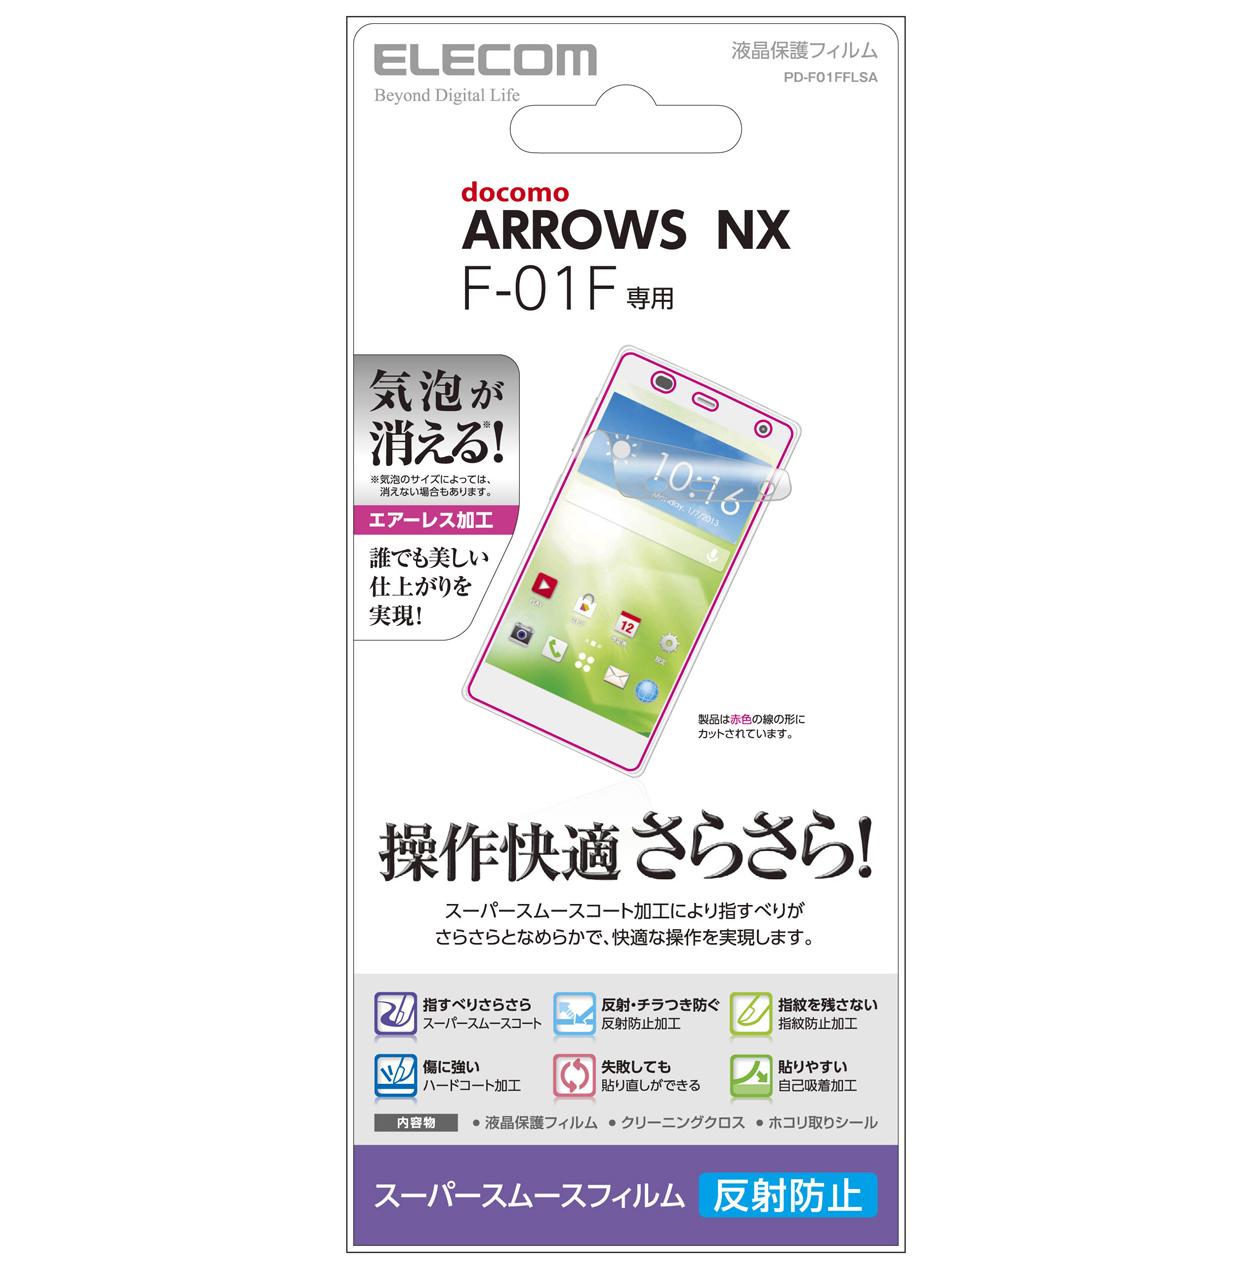 http://www.ndid.net/blog_ndid/image/150201_smartPhone.jpg